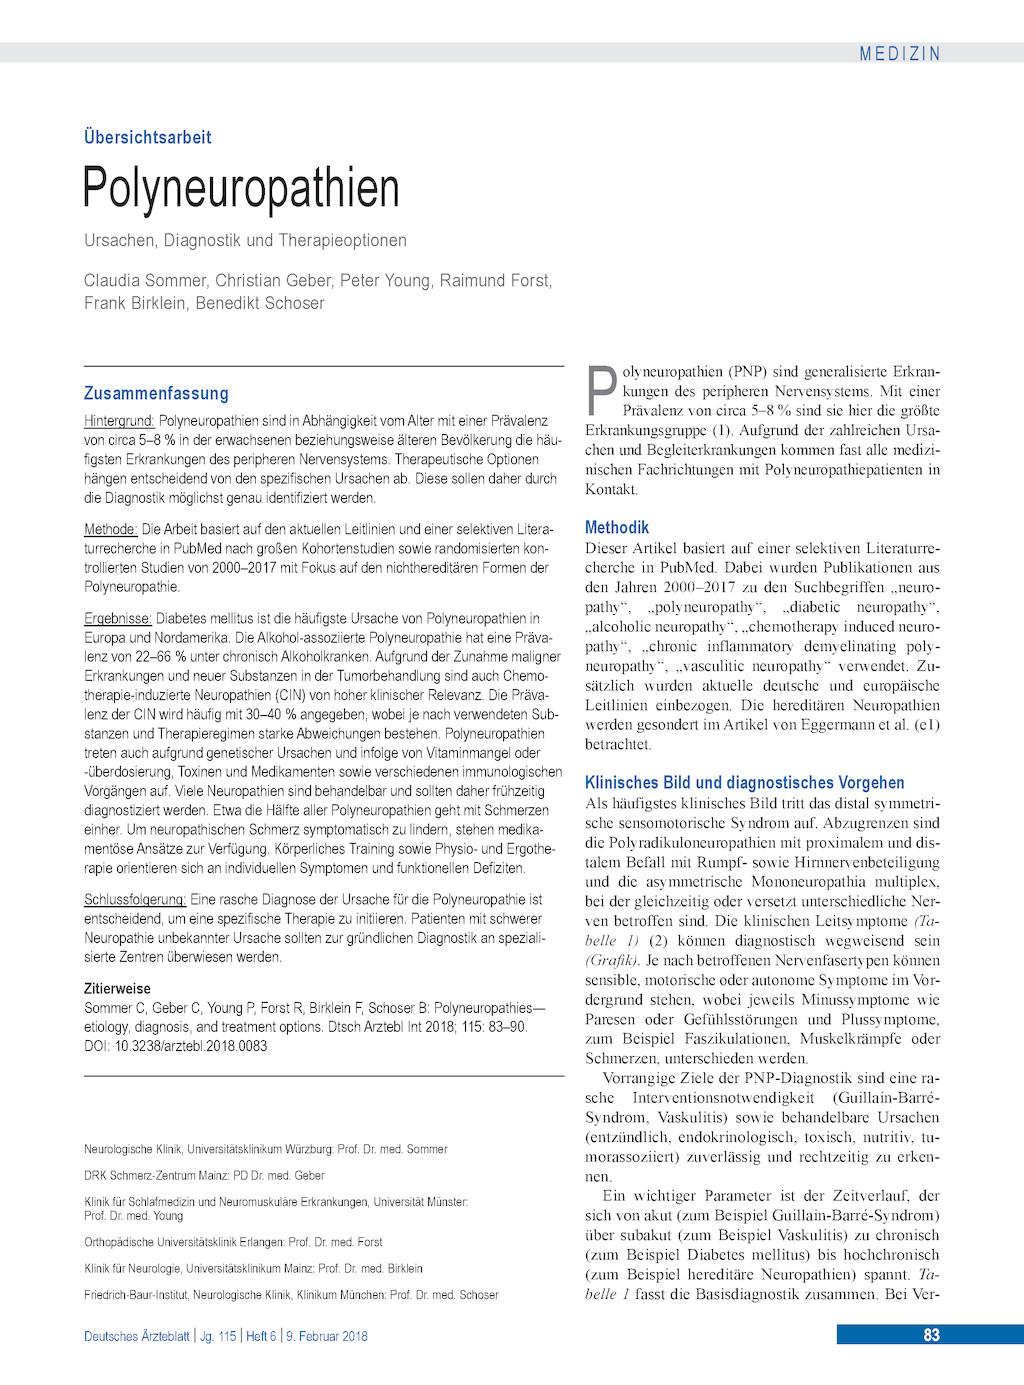 neuropathie medikamente